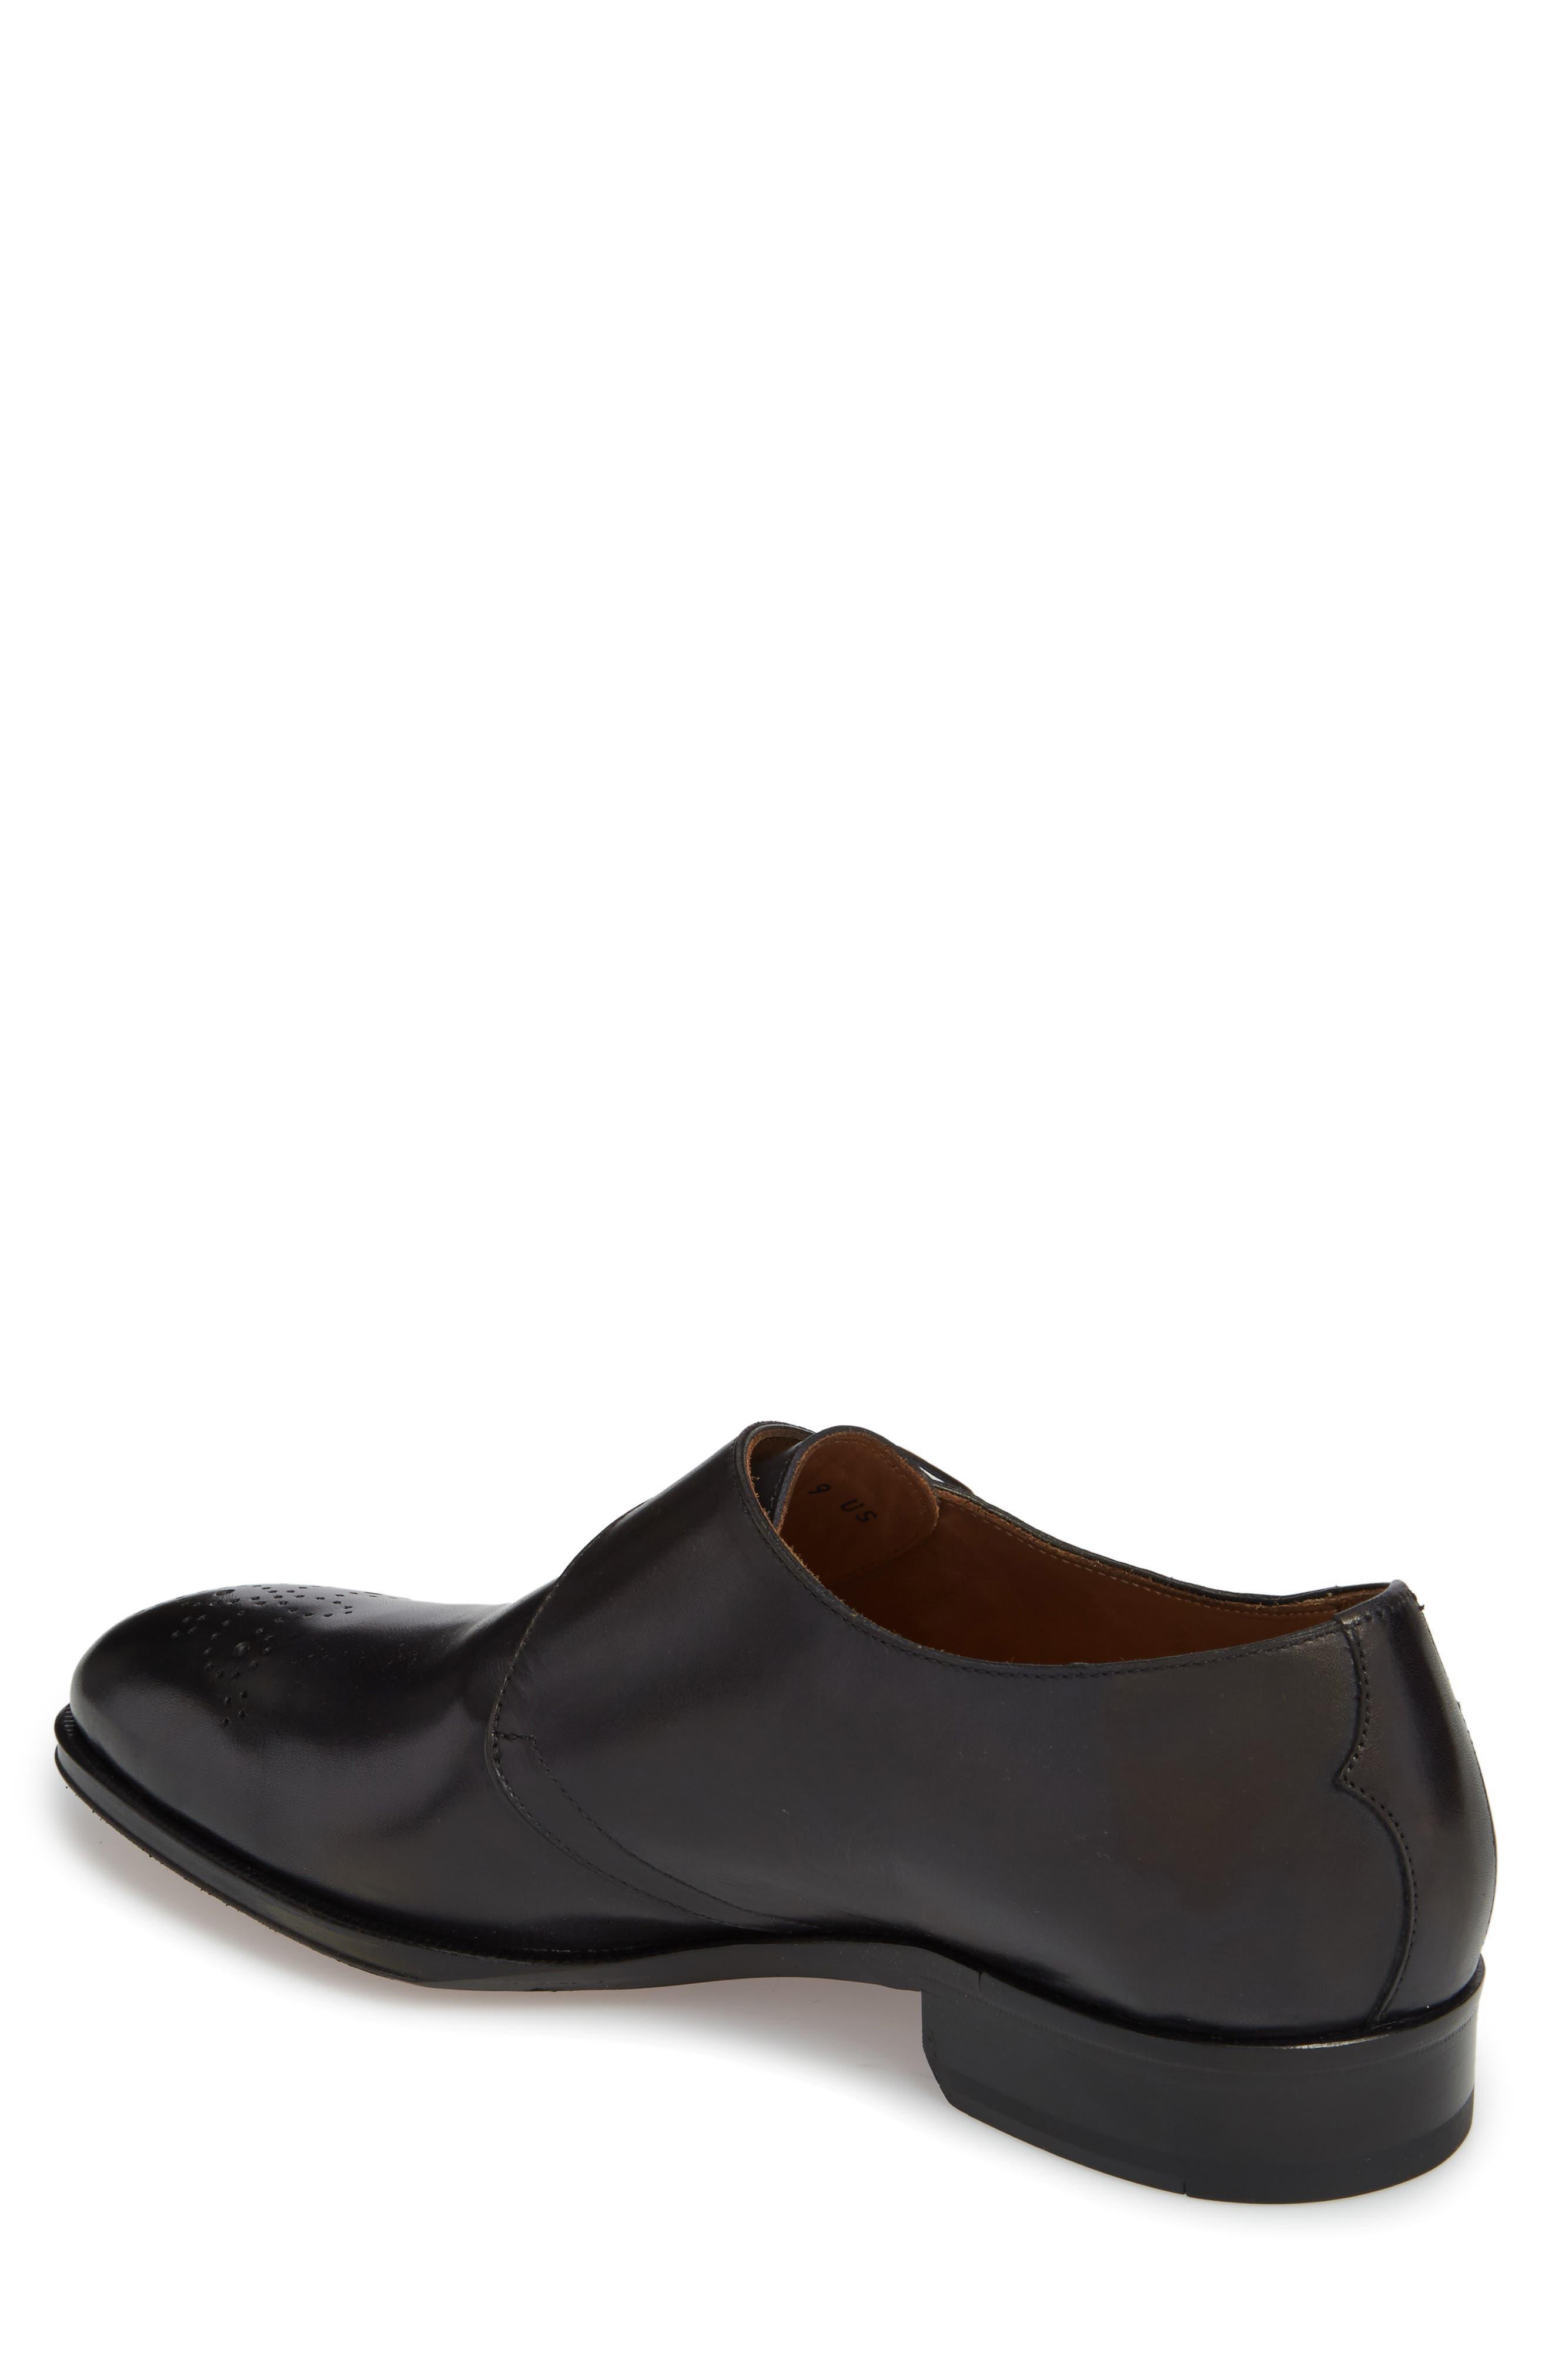 Gallo Bianco Bologna Monk Strap Shoe,                             Alternate thumbnail 2, color,                             402